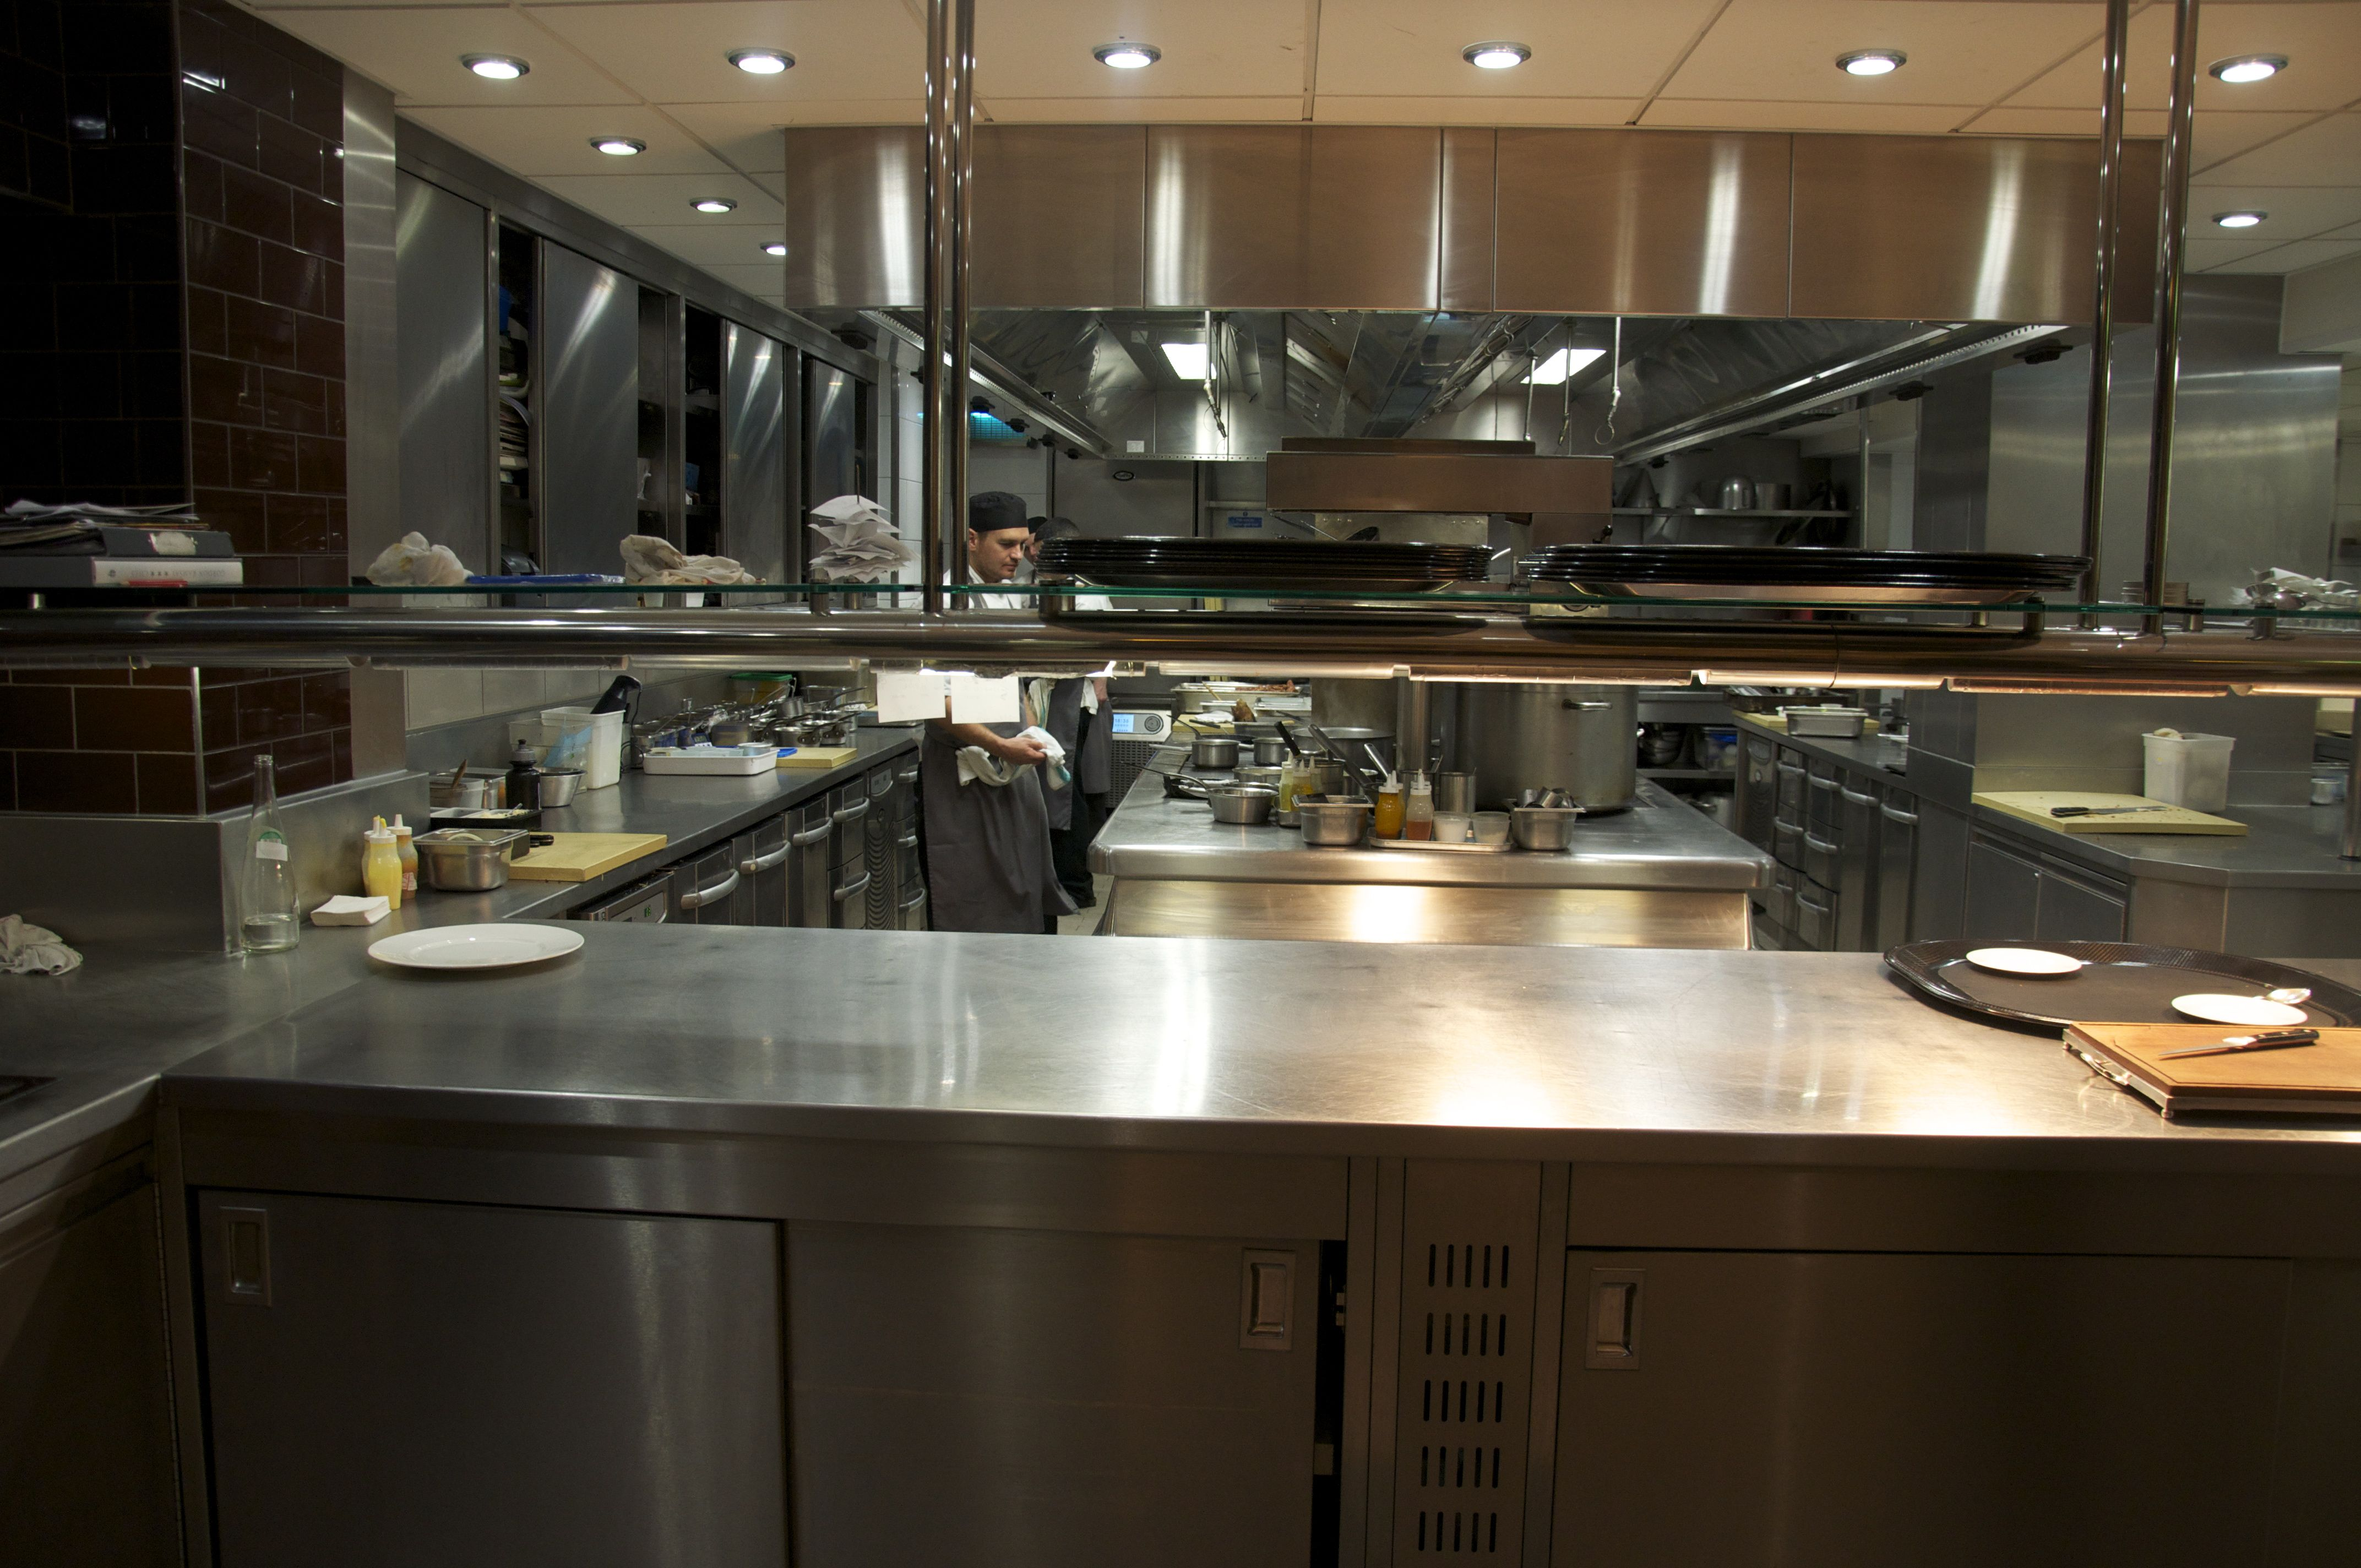 Petrus London Kitchen | Restaurant kitchen, Kitchens and Commercial ...